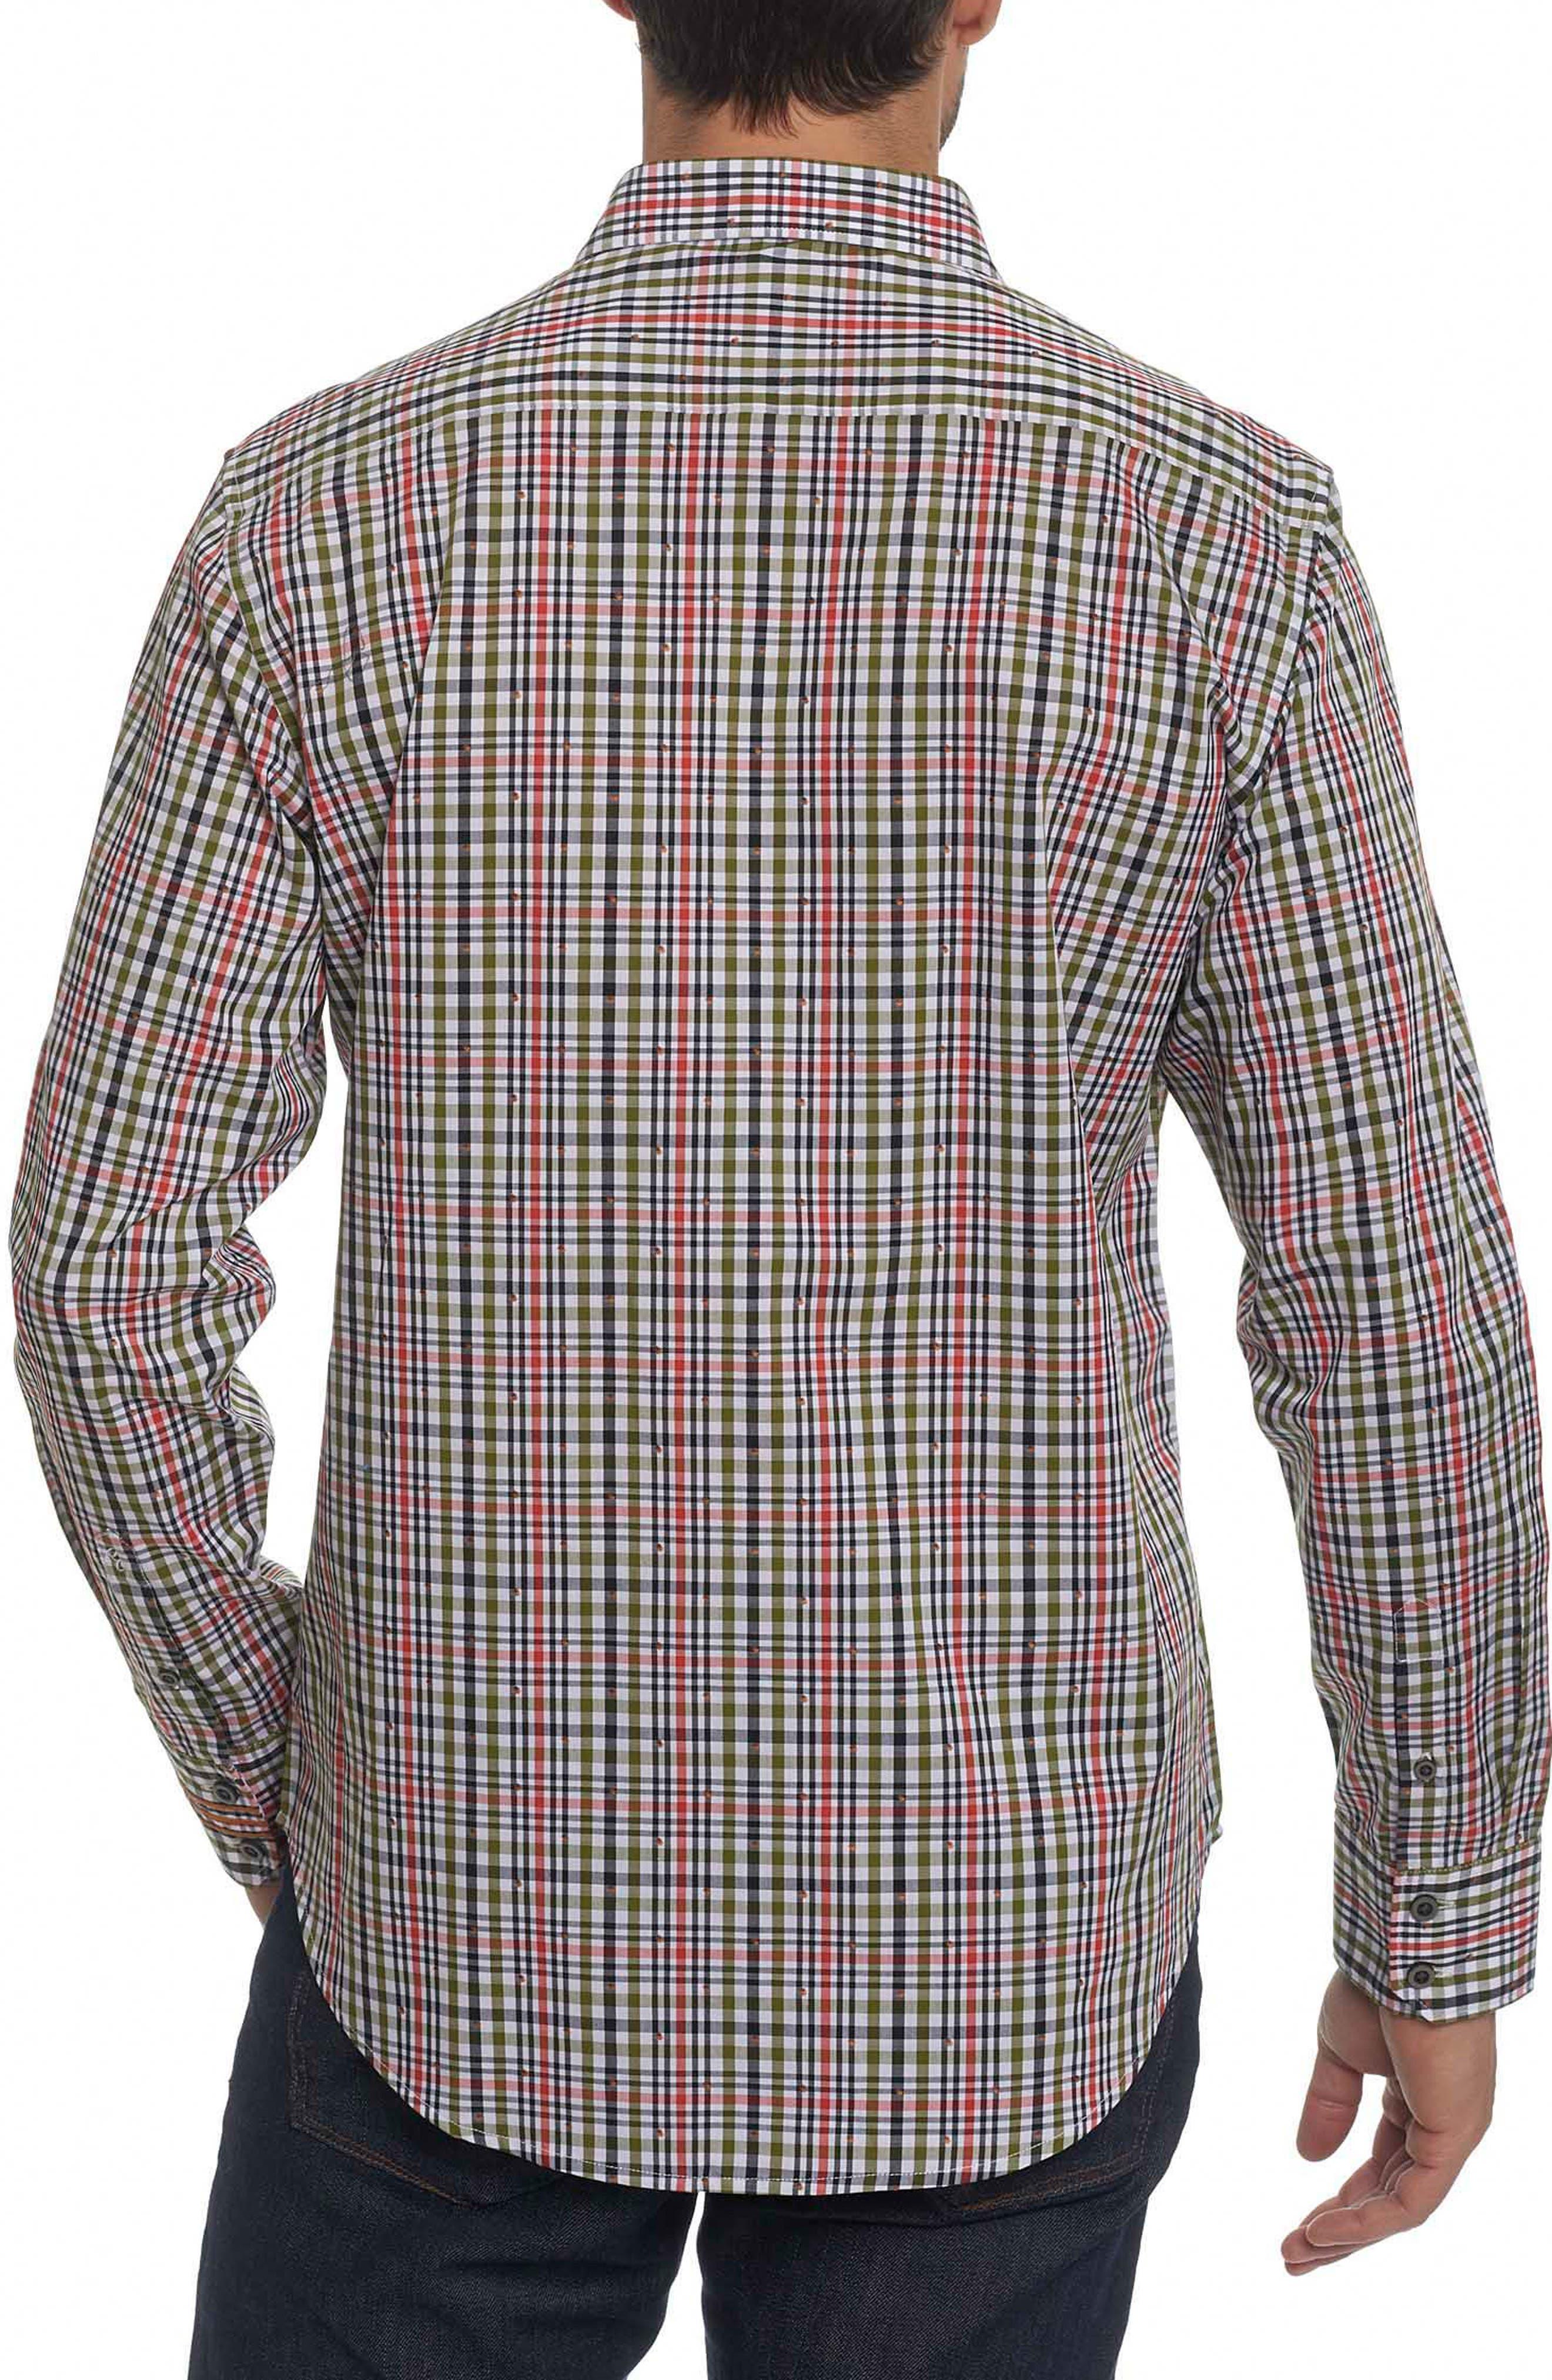 ROBERT GRAHAM,                             Cape Vincent Classic Fit Dobby Check Sport Shirt,                             Alternate thumbnail 2, color,                             308